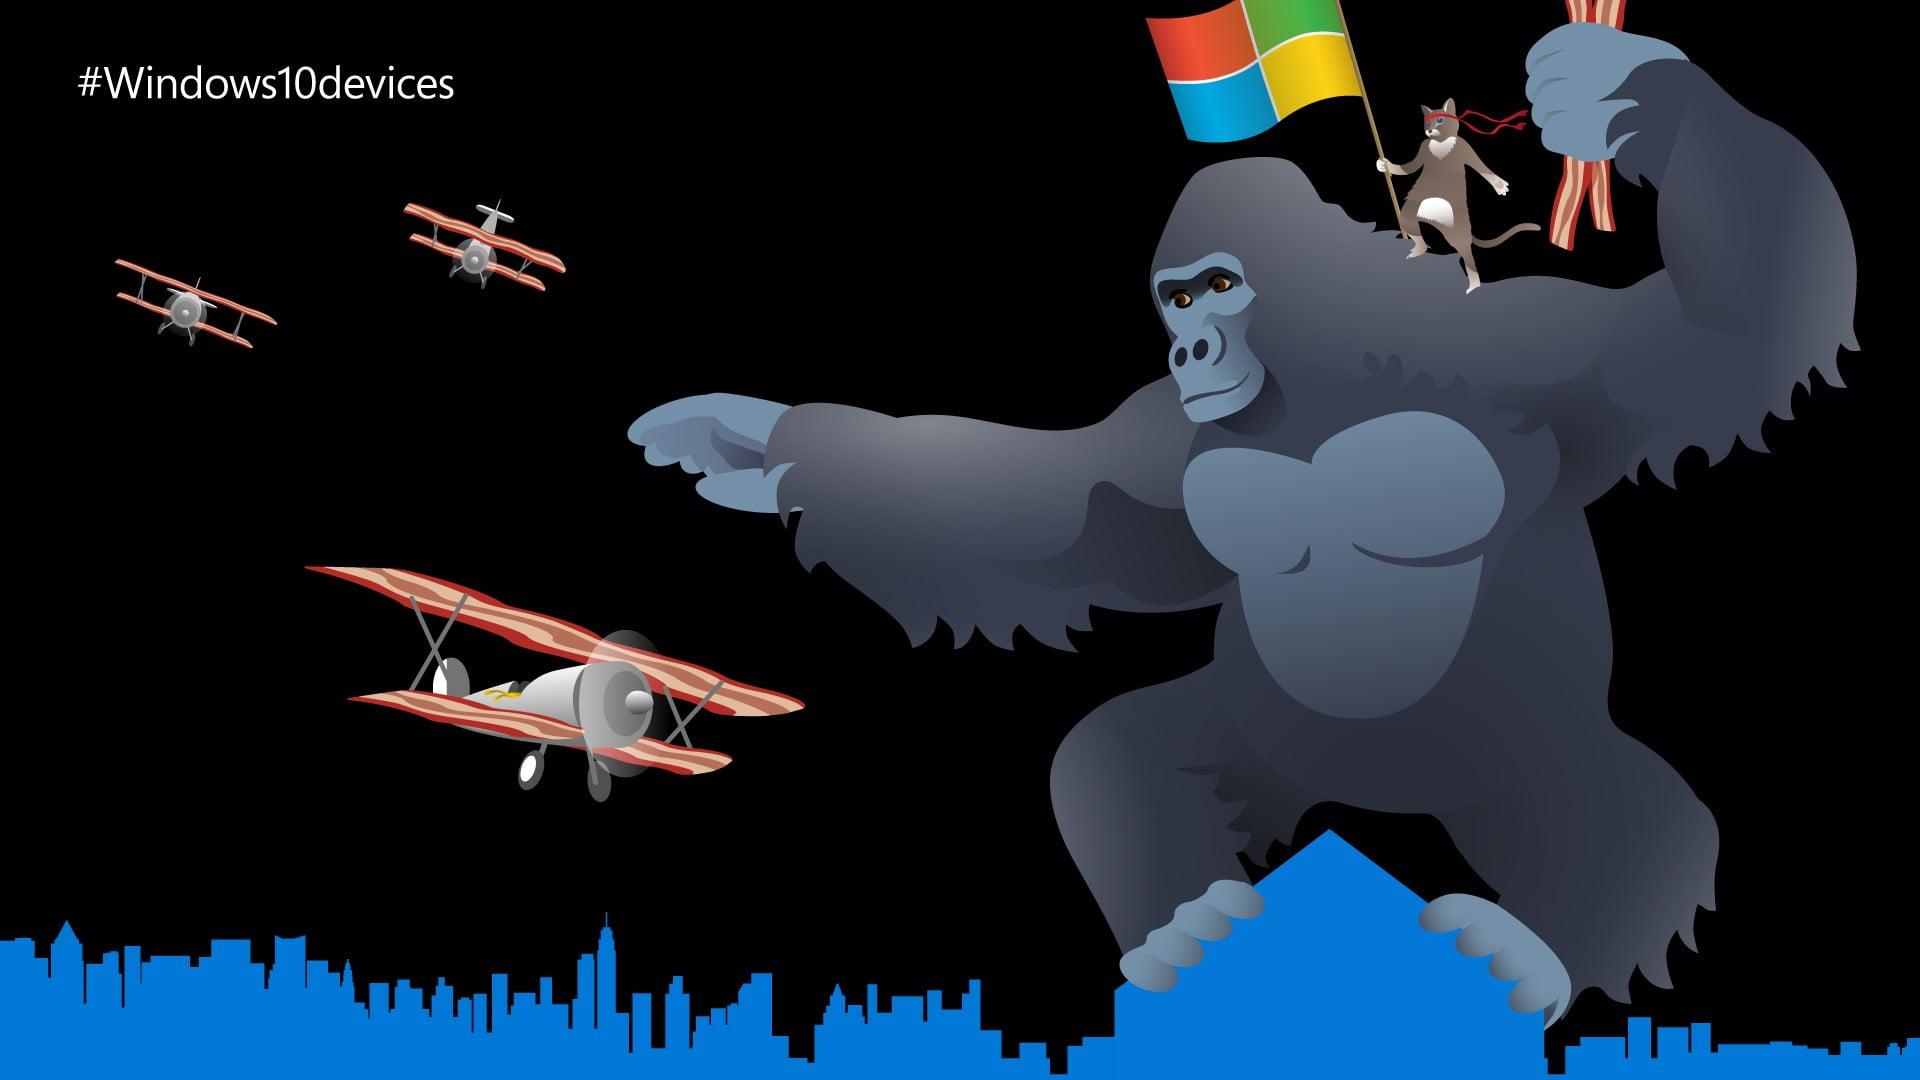 Gorila mascota del programa Insider